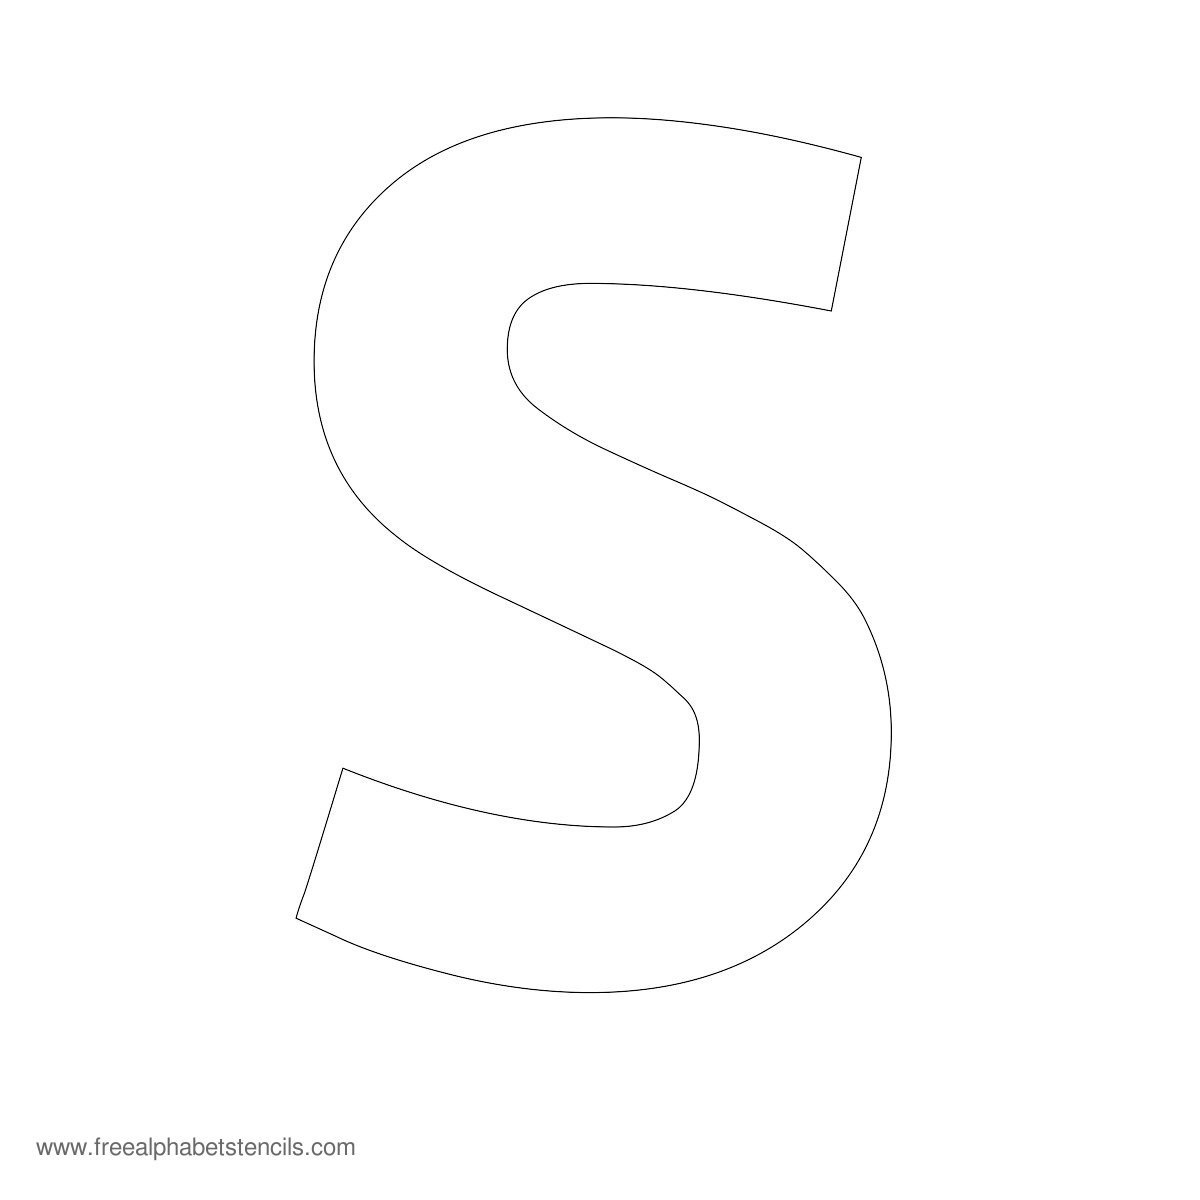 Large Alphabet Stencils | Freealphabetstencils - Free Printable Greek Letters